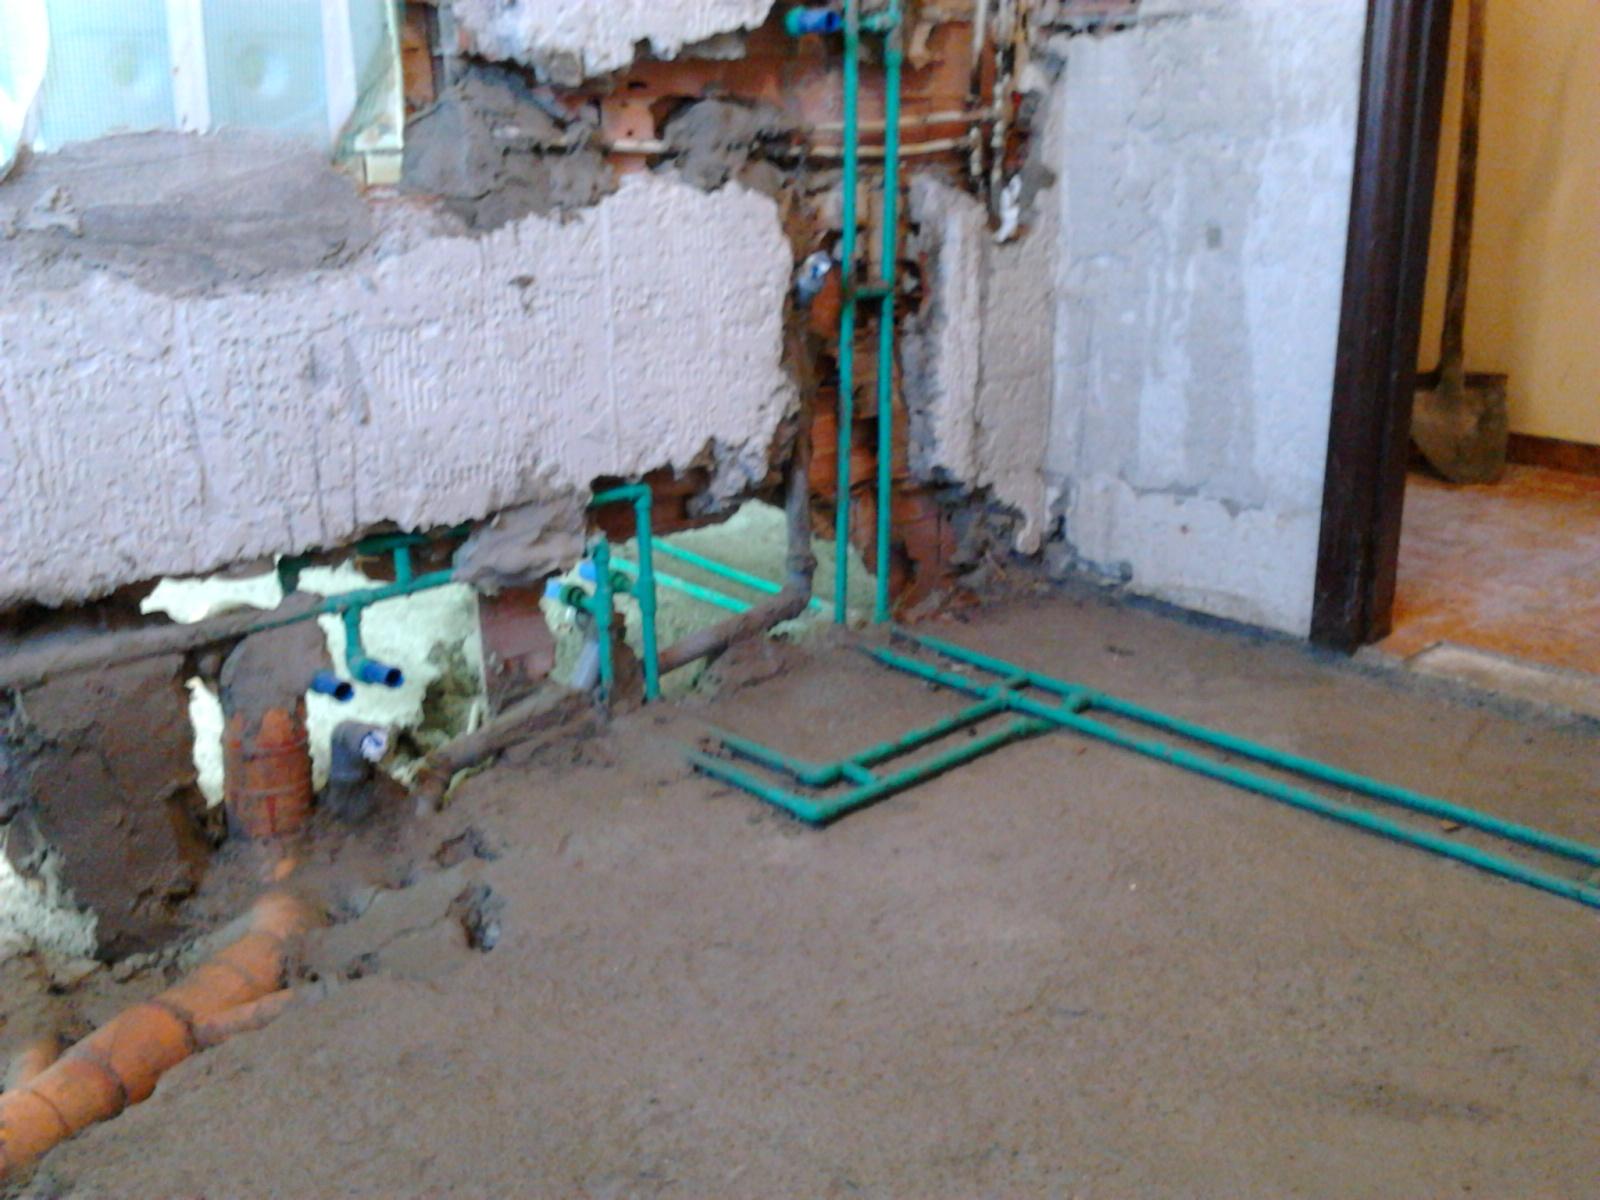 Il Blog dell'idraulico: Tubi polipropilene flessibili